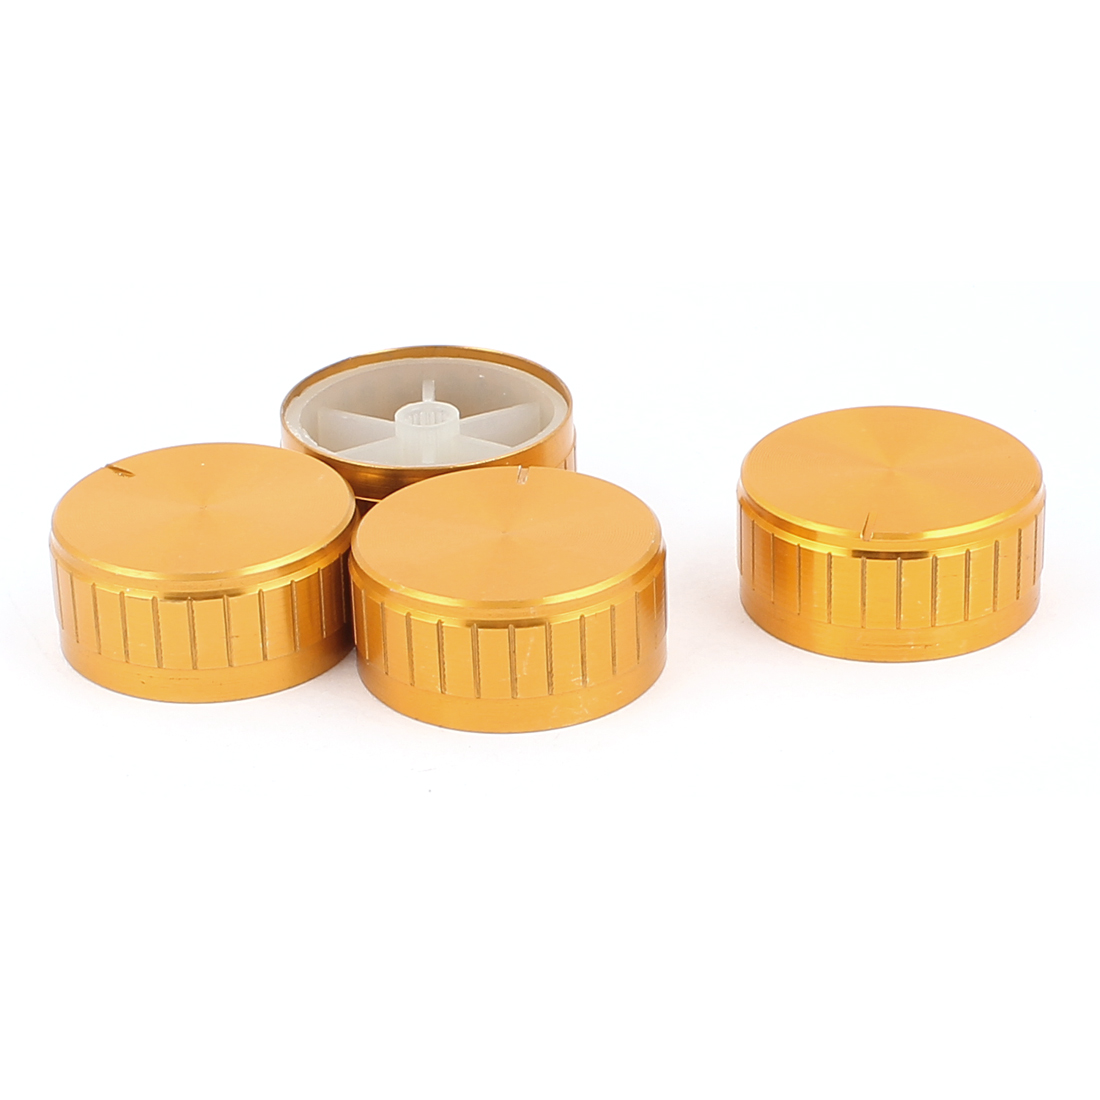 4 Pcs 40mm x 6mm Aluminium Alloy Potentiometer Control Knob Volume Cap Knurled Button Gold Tone